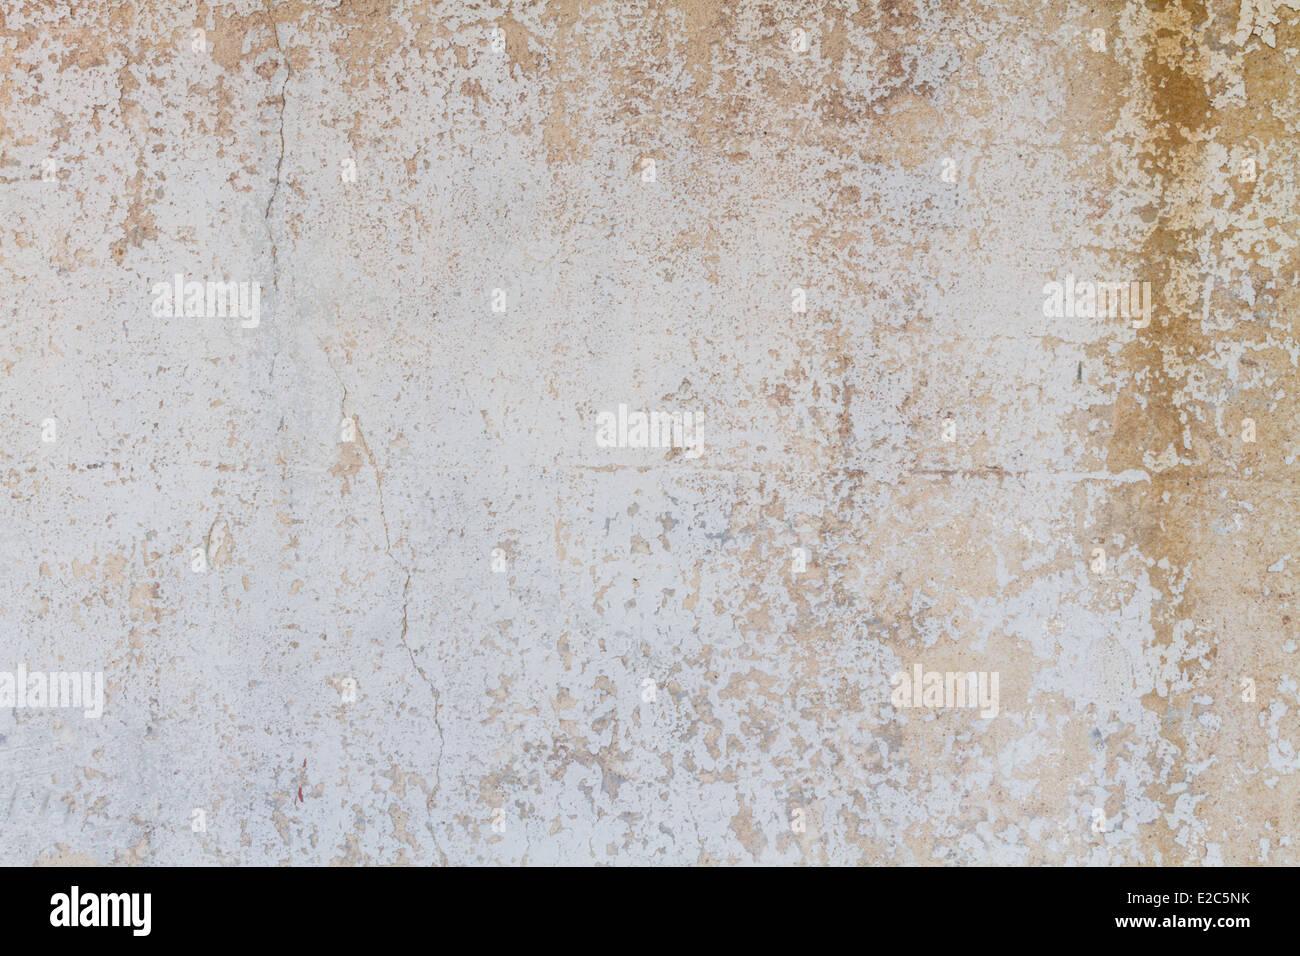 Superficie ruvida vernice pelata sfondo. Immagini Stock